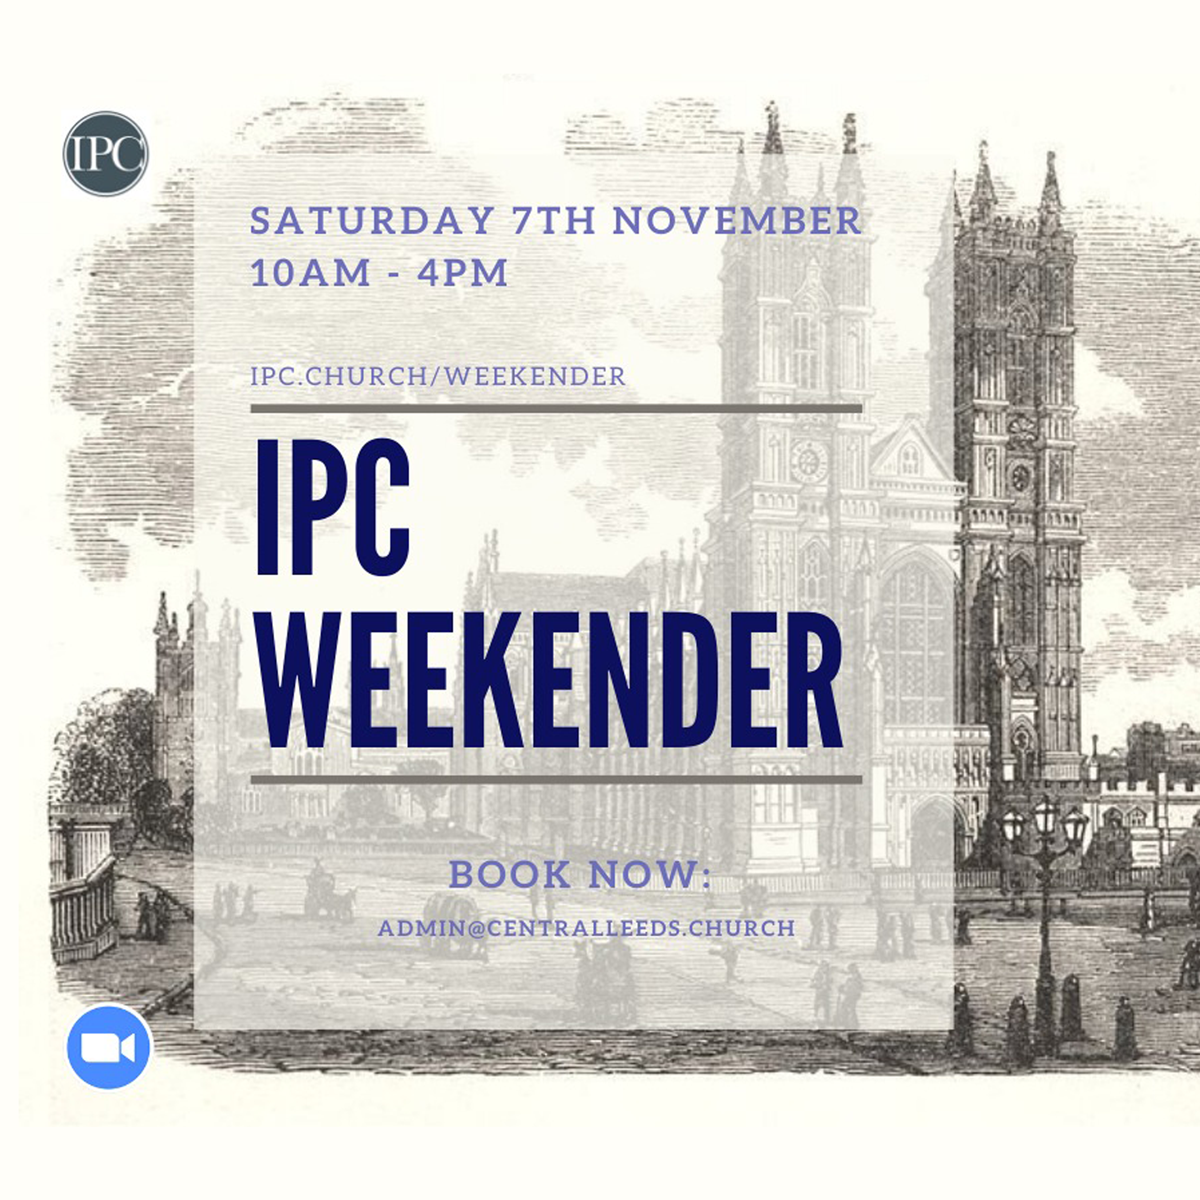 IPC Weekender